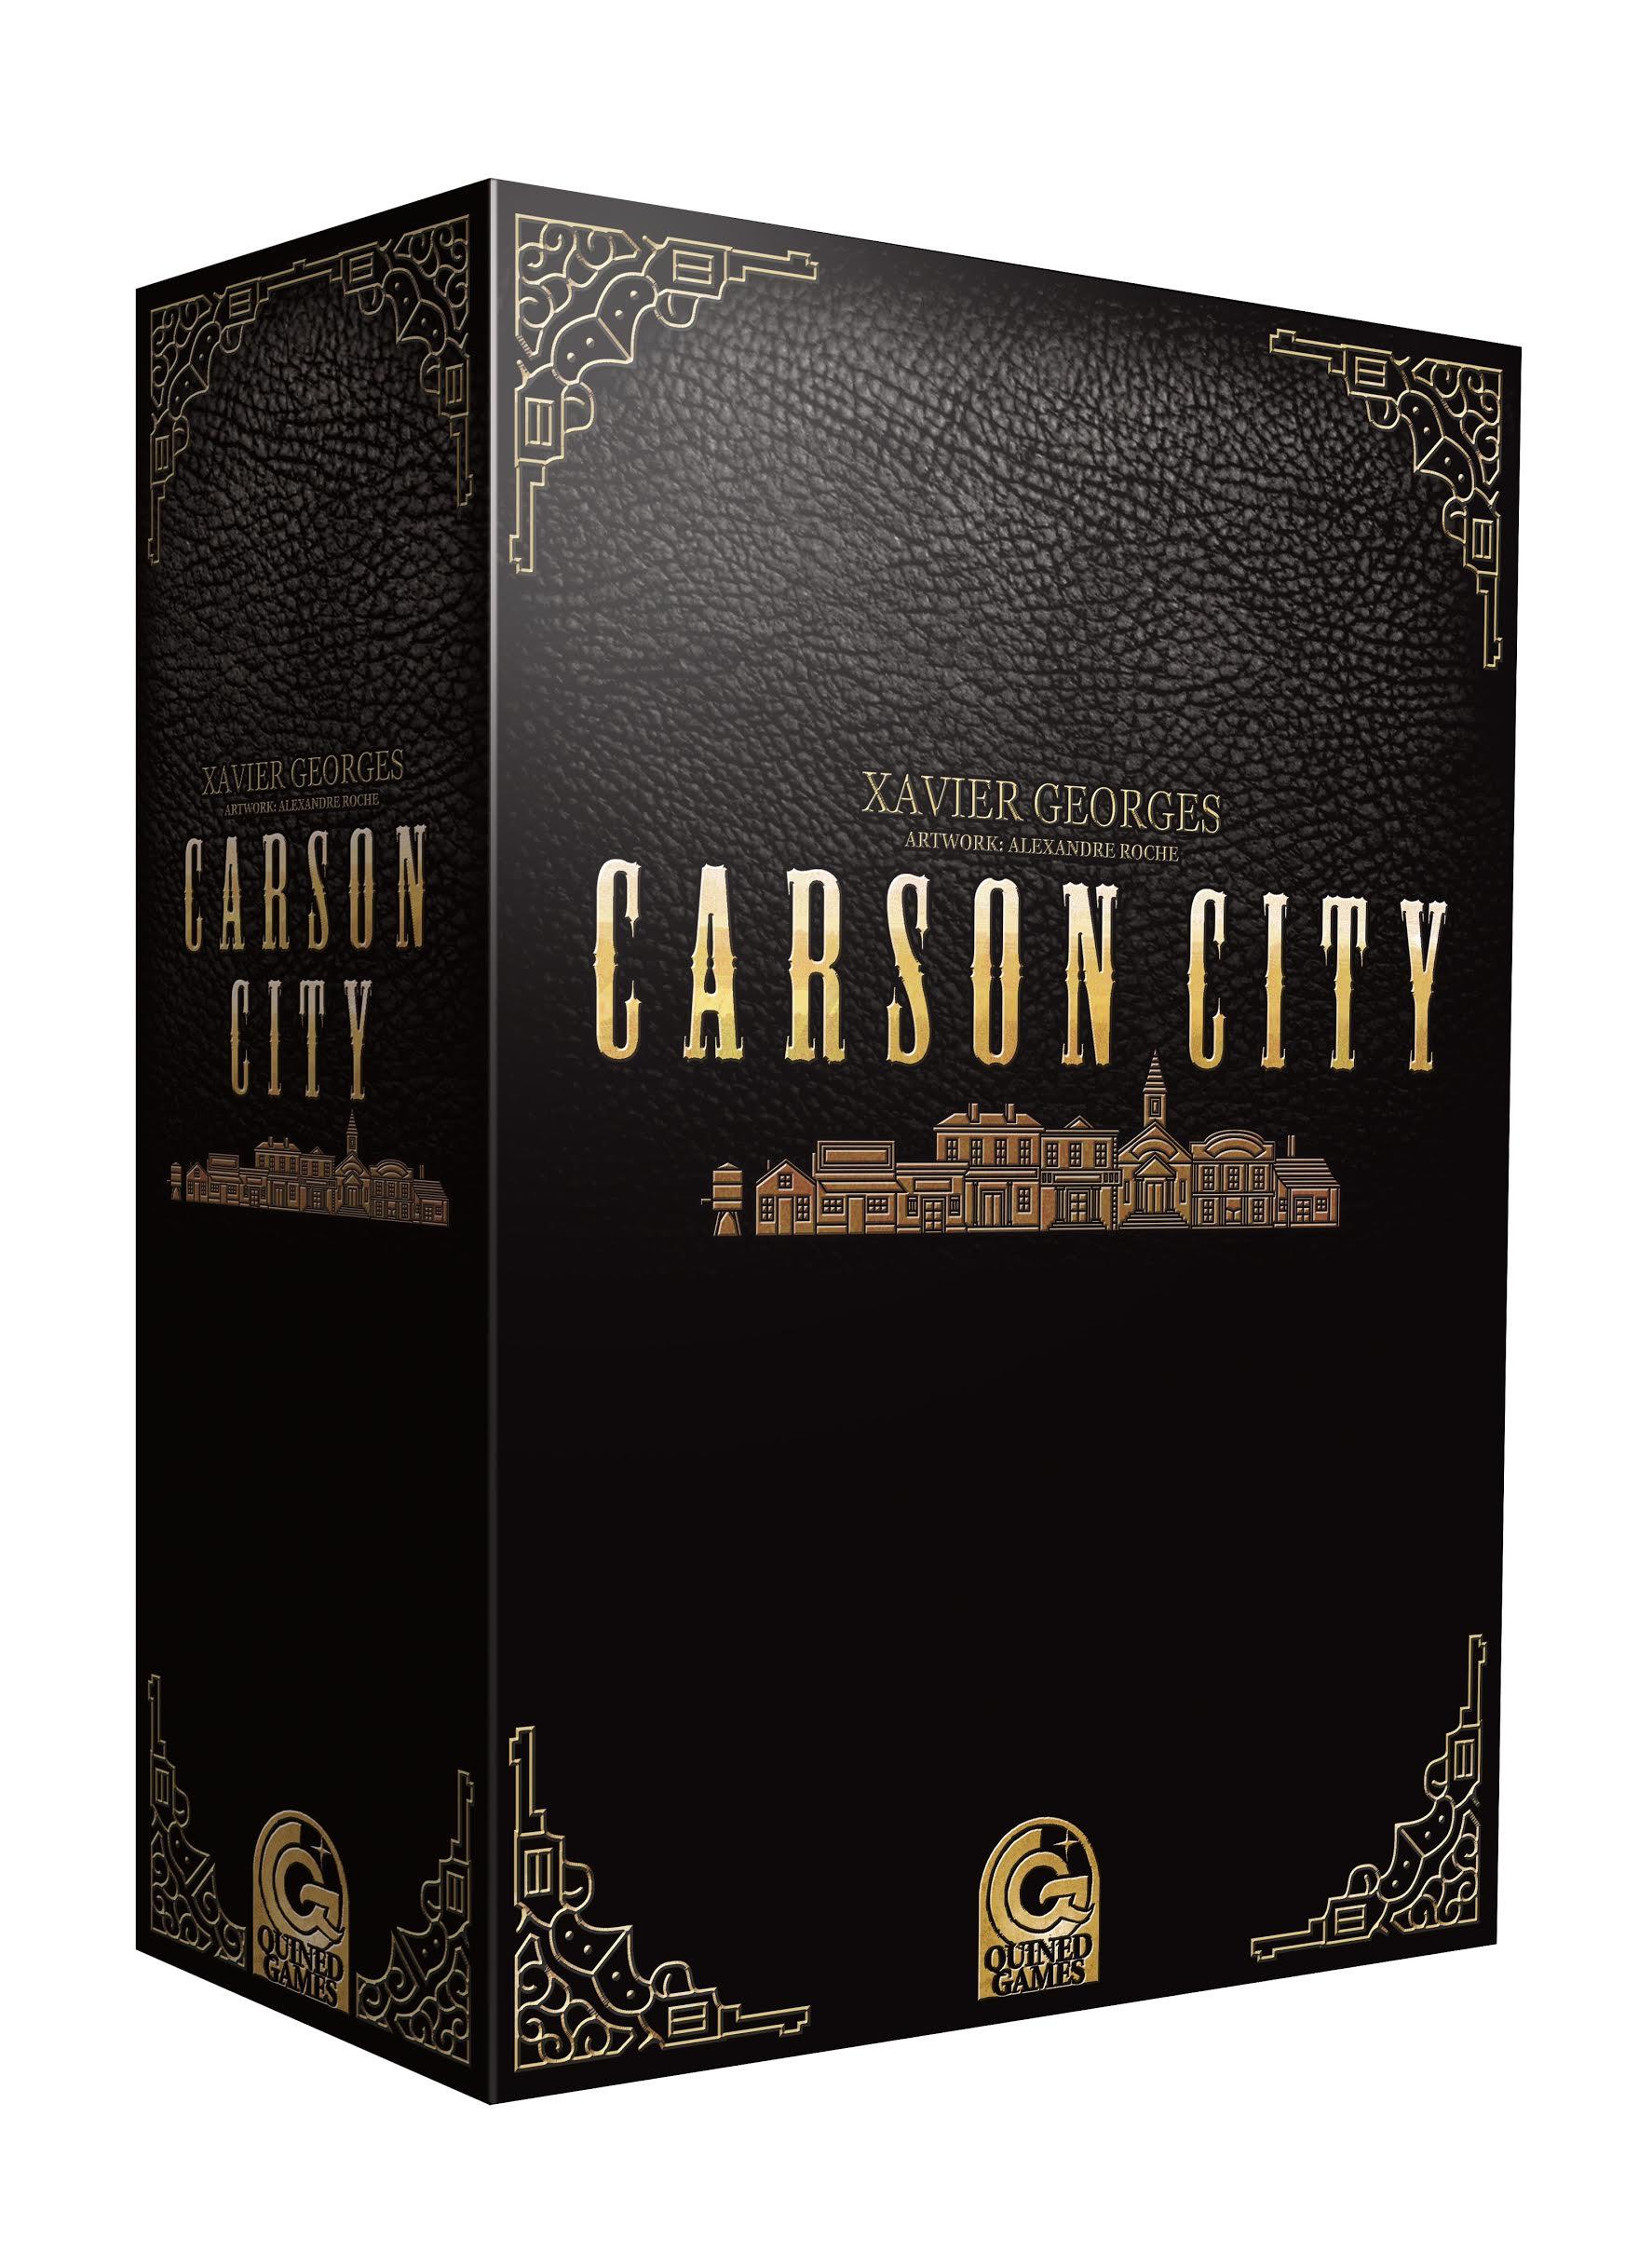 carscon-city-bb_nrvnmc